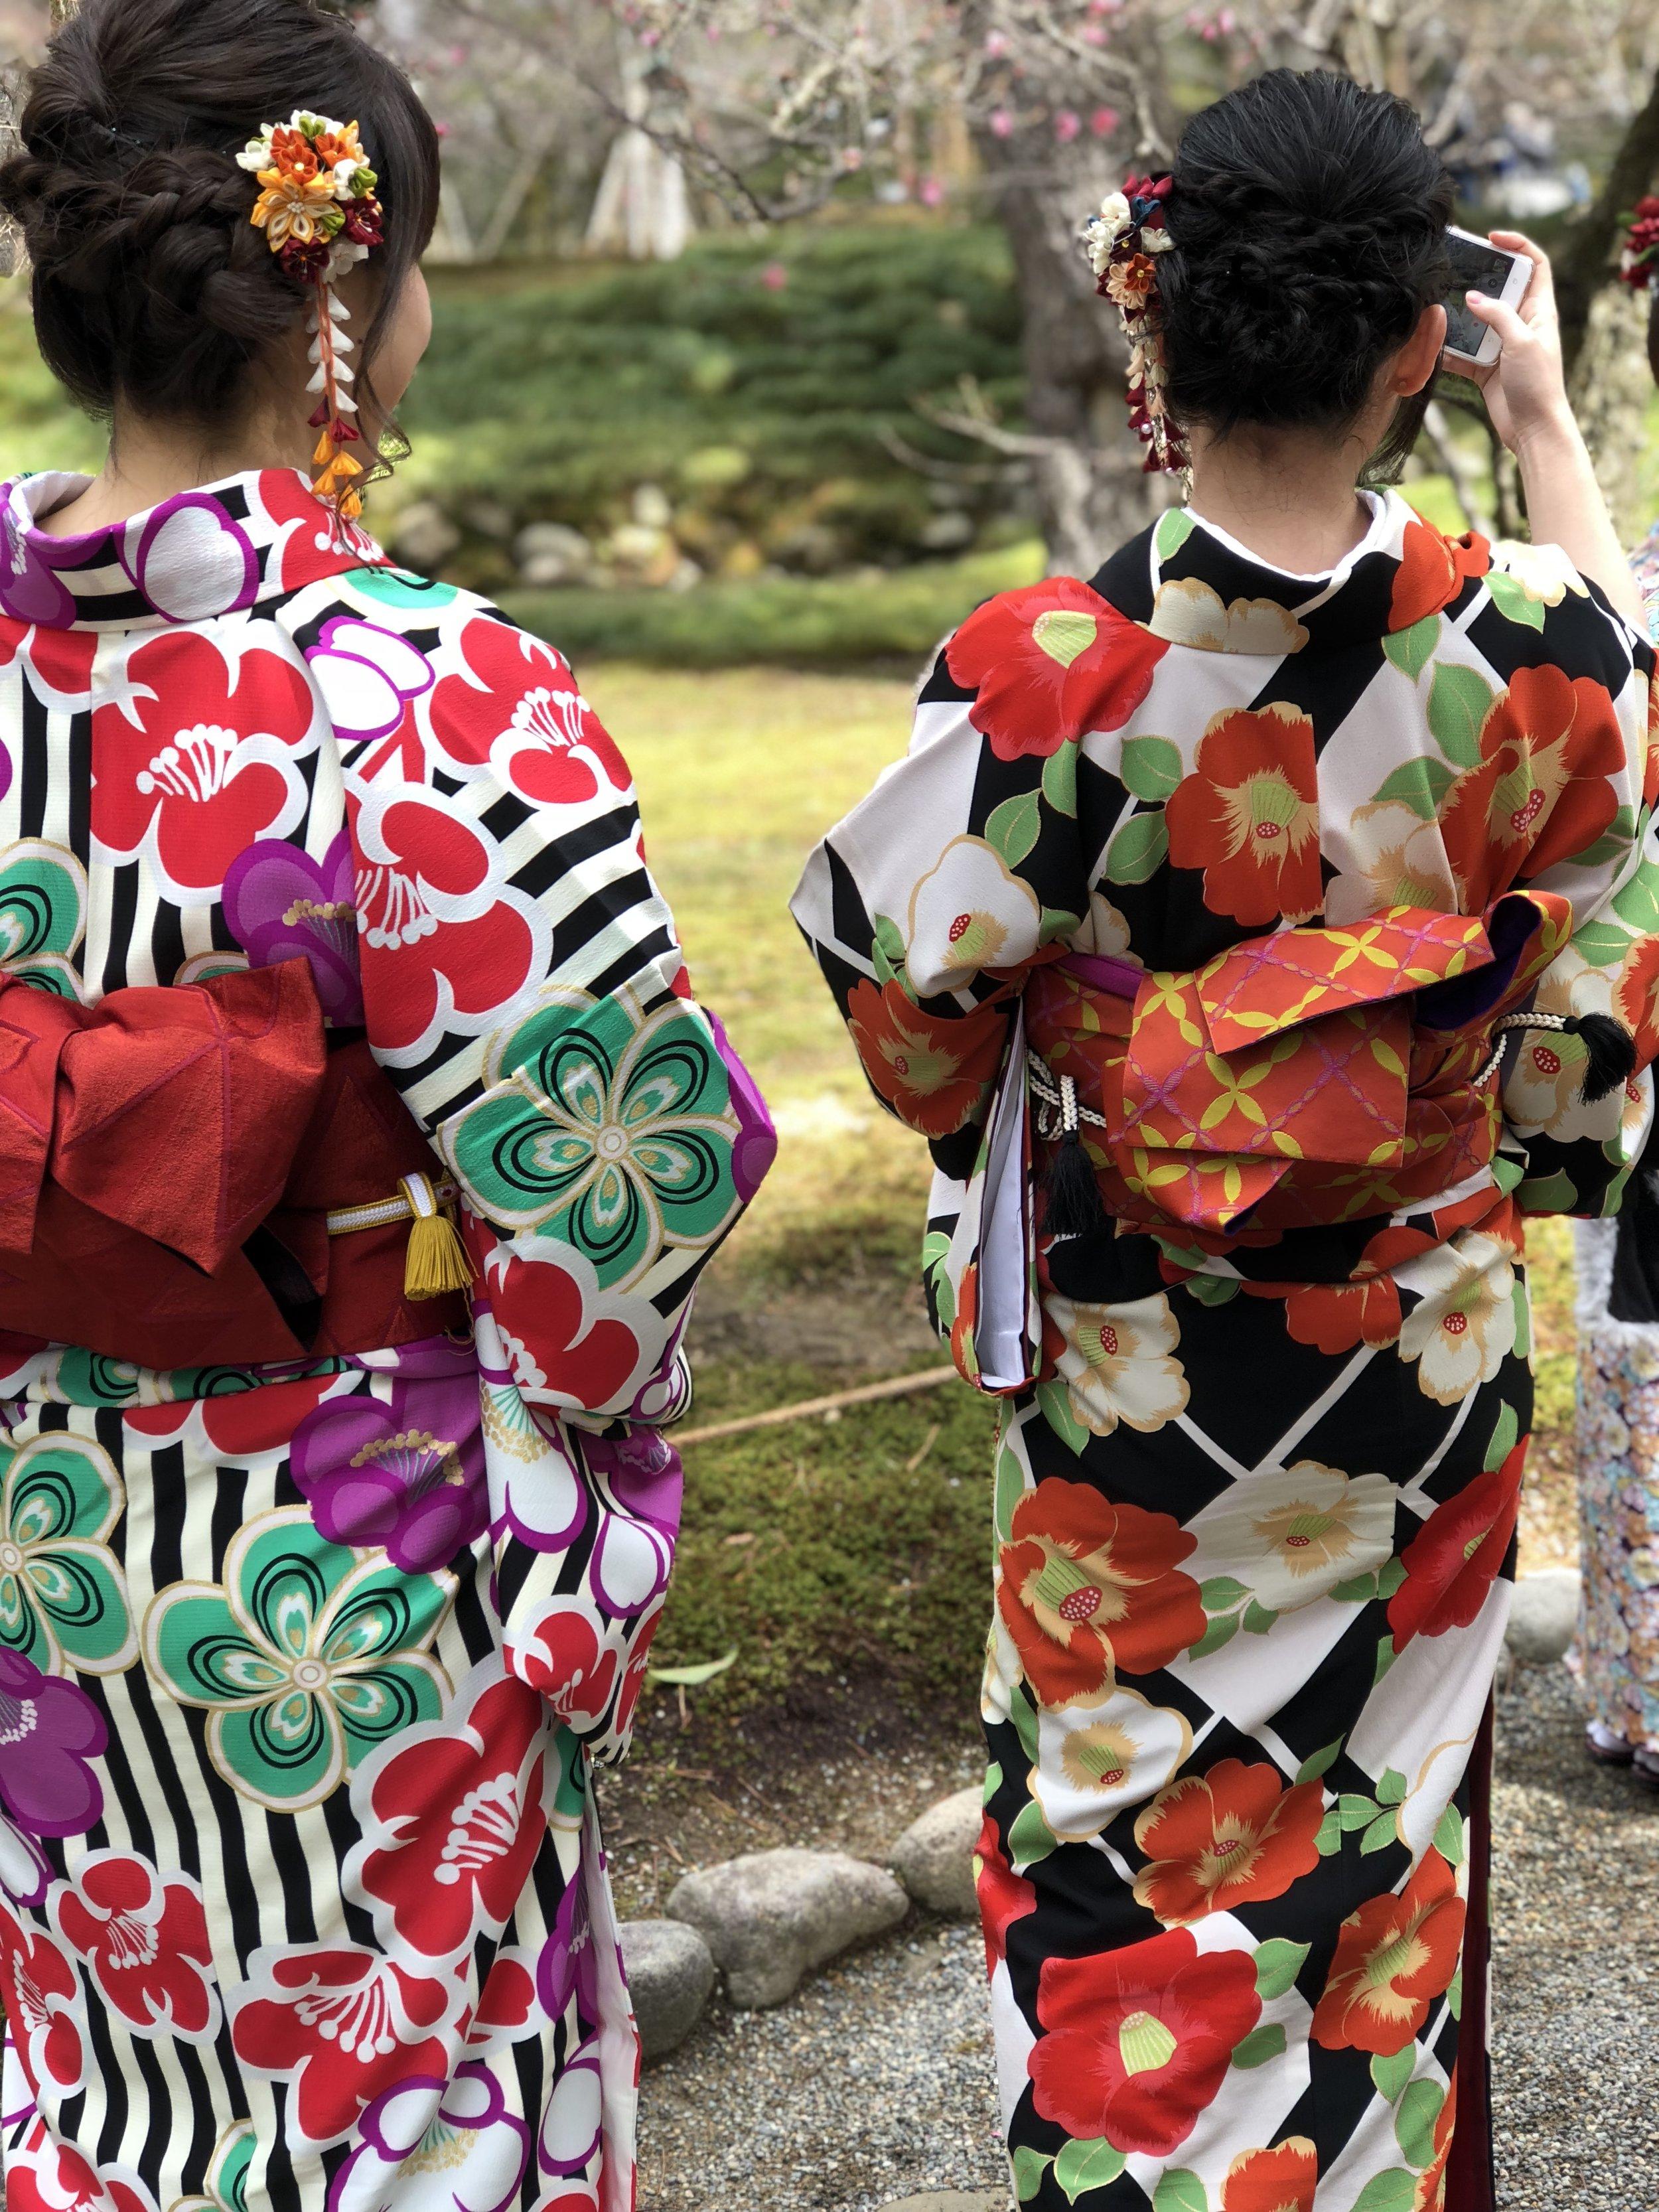 Young locals sakura-spotting in Kenrokuen gardens, Kanazawa.